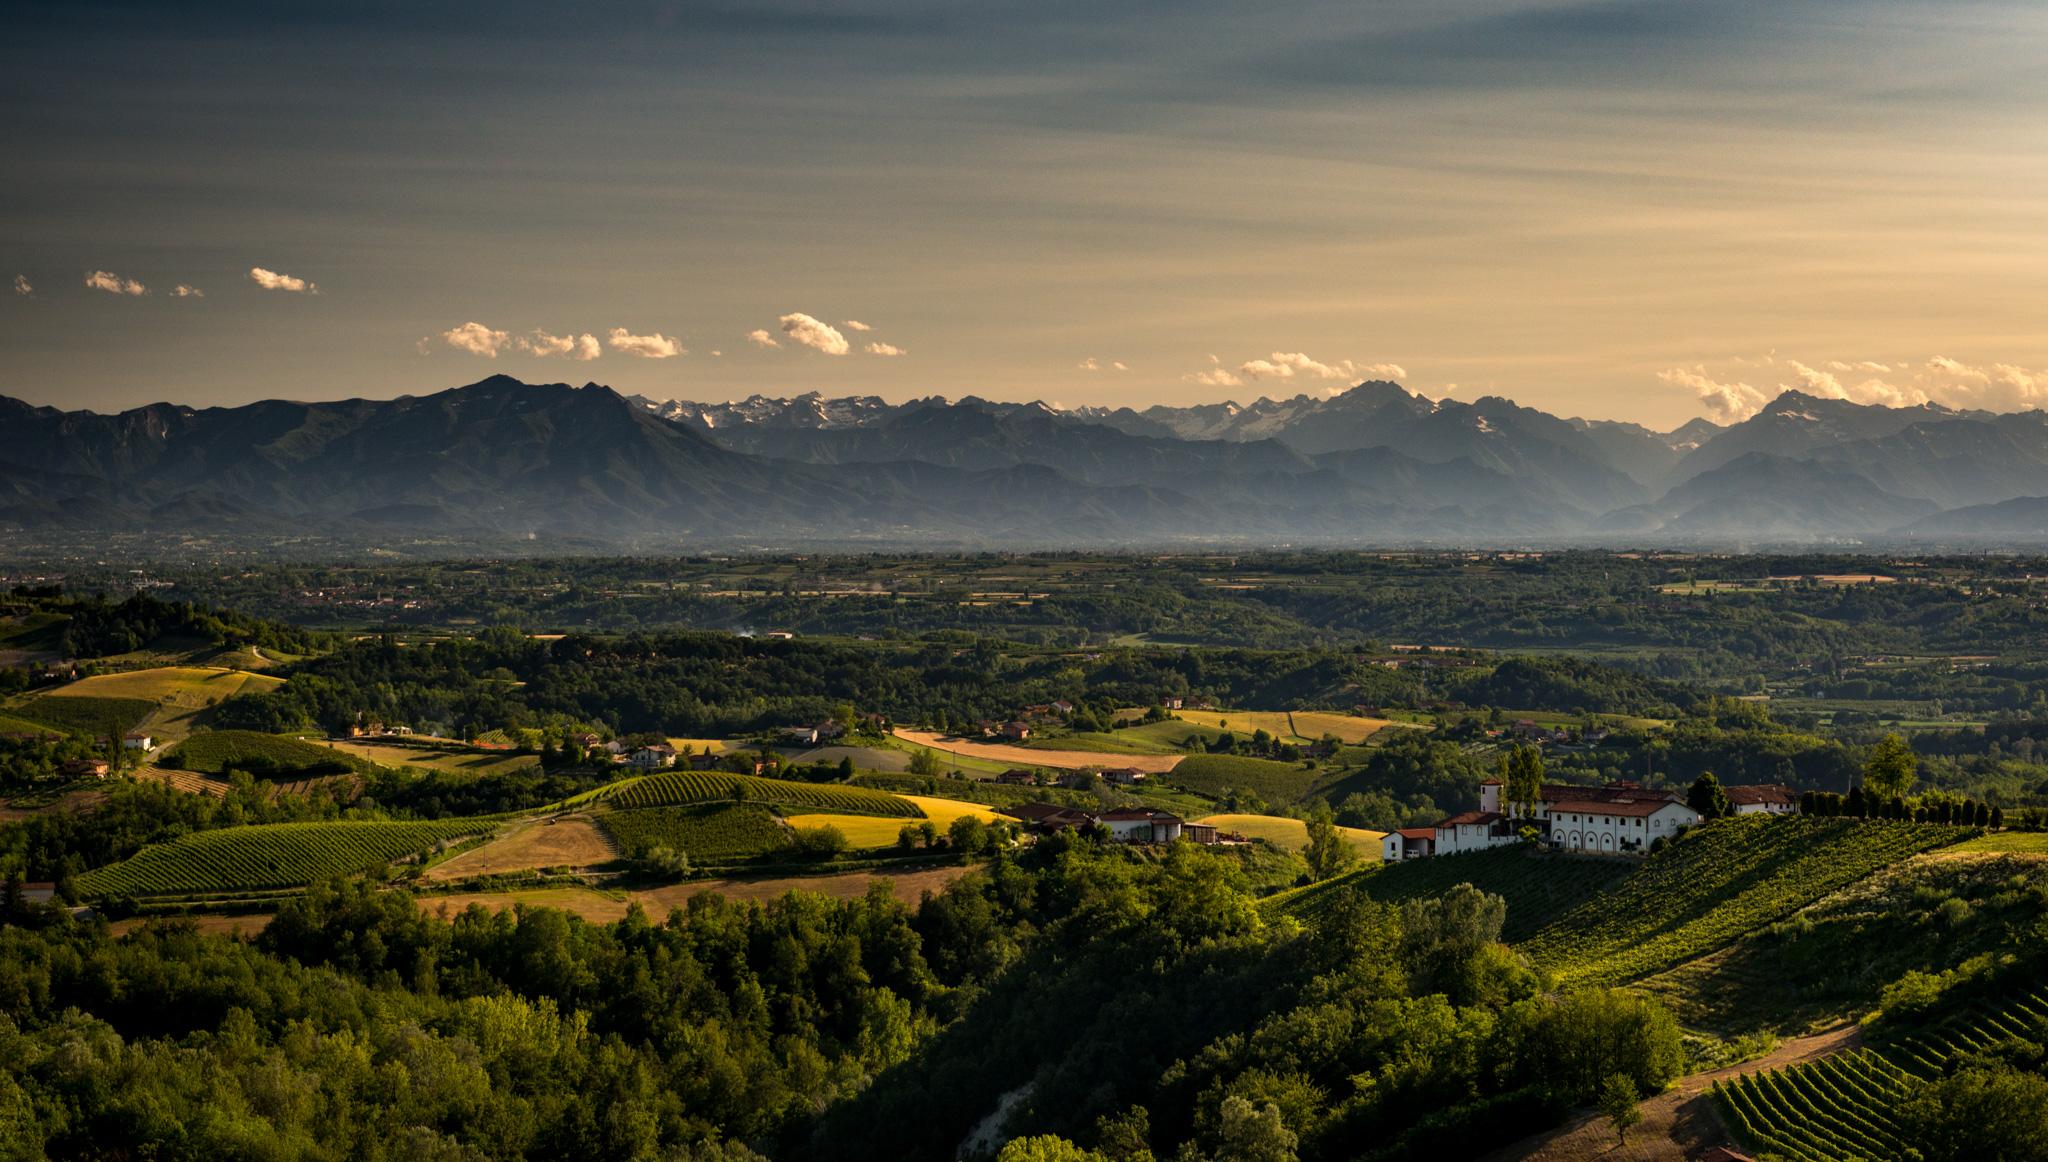 Italy : Piedmont : Monforte d'Alba with Rocche dei Manzoni on the right